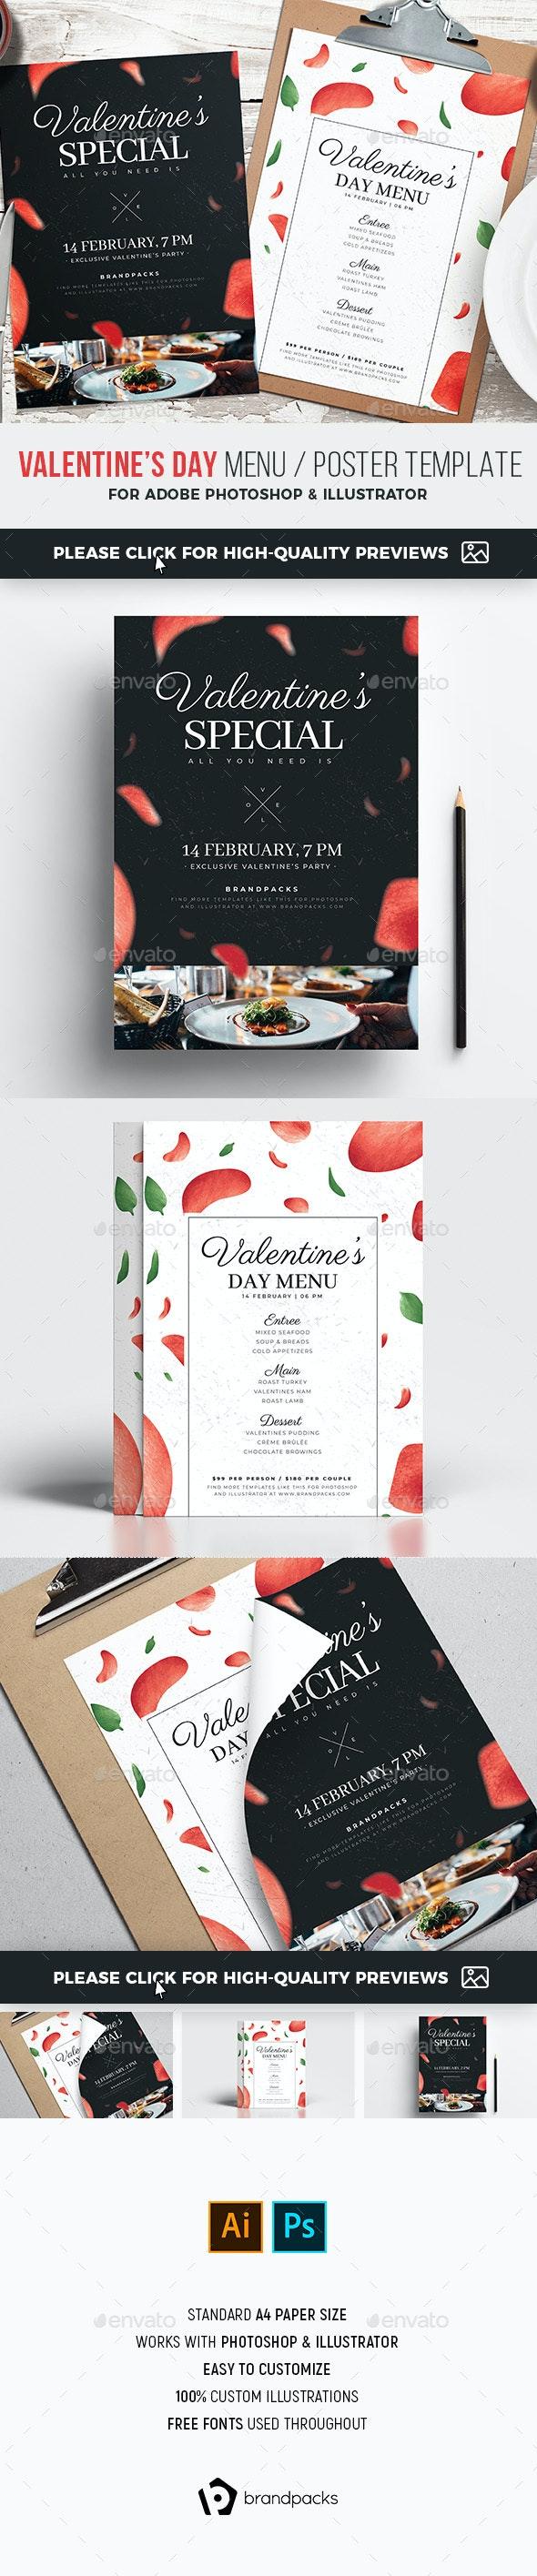 Valentine's Day Menu / Poster Template - Food Menus Print Templates